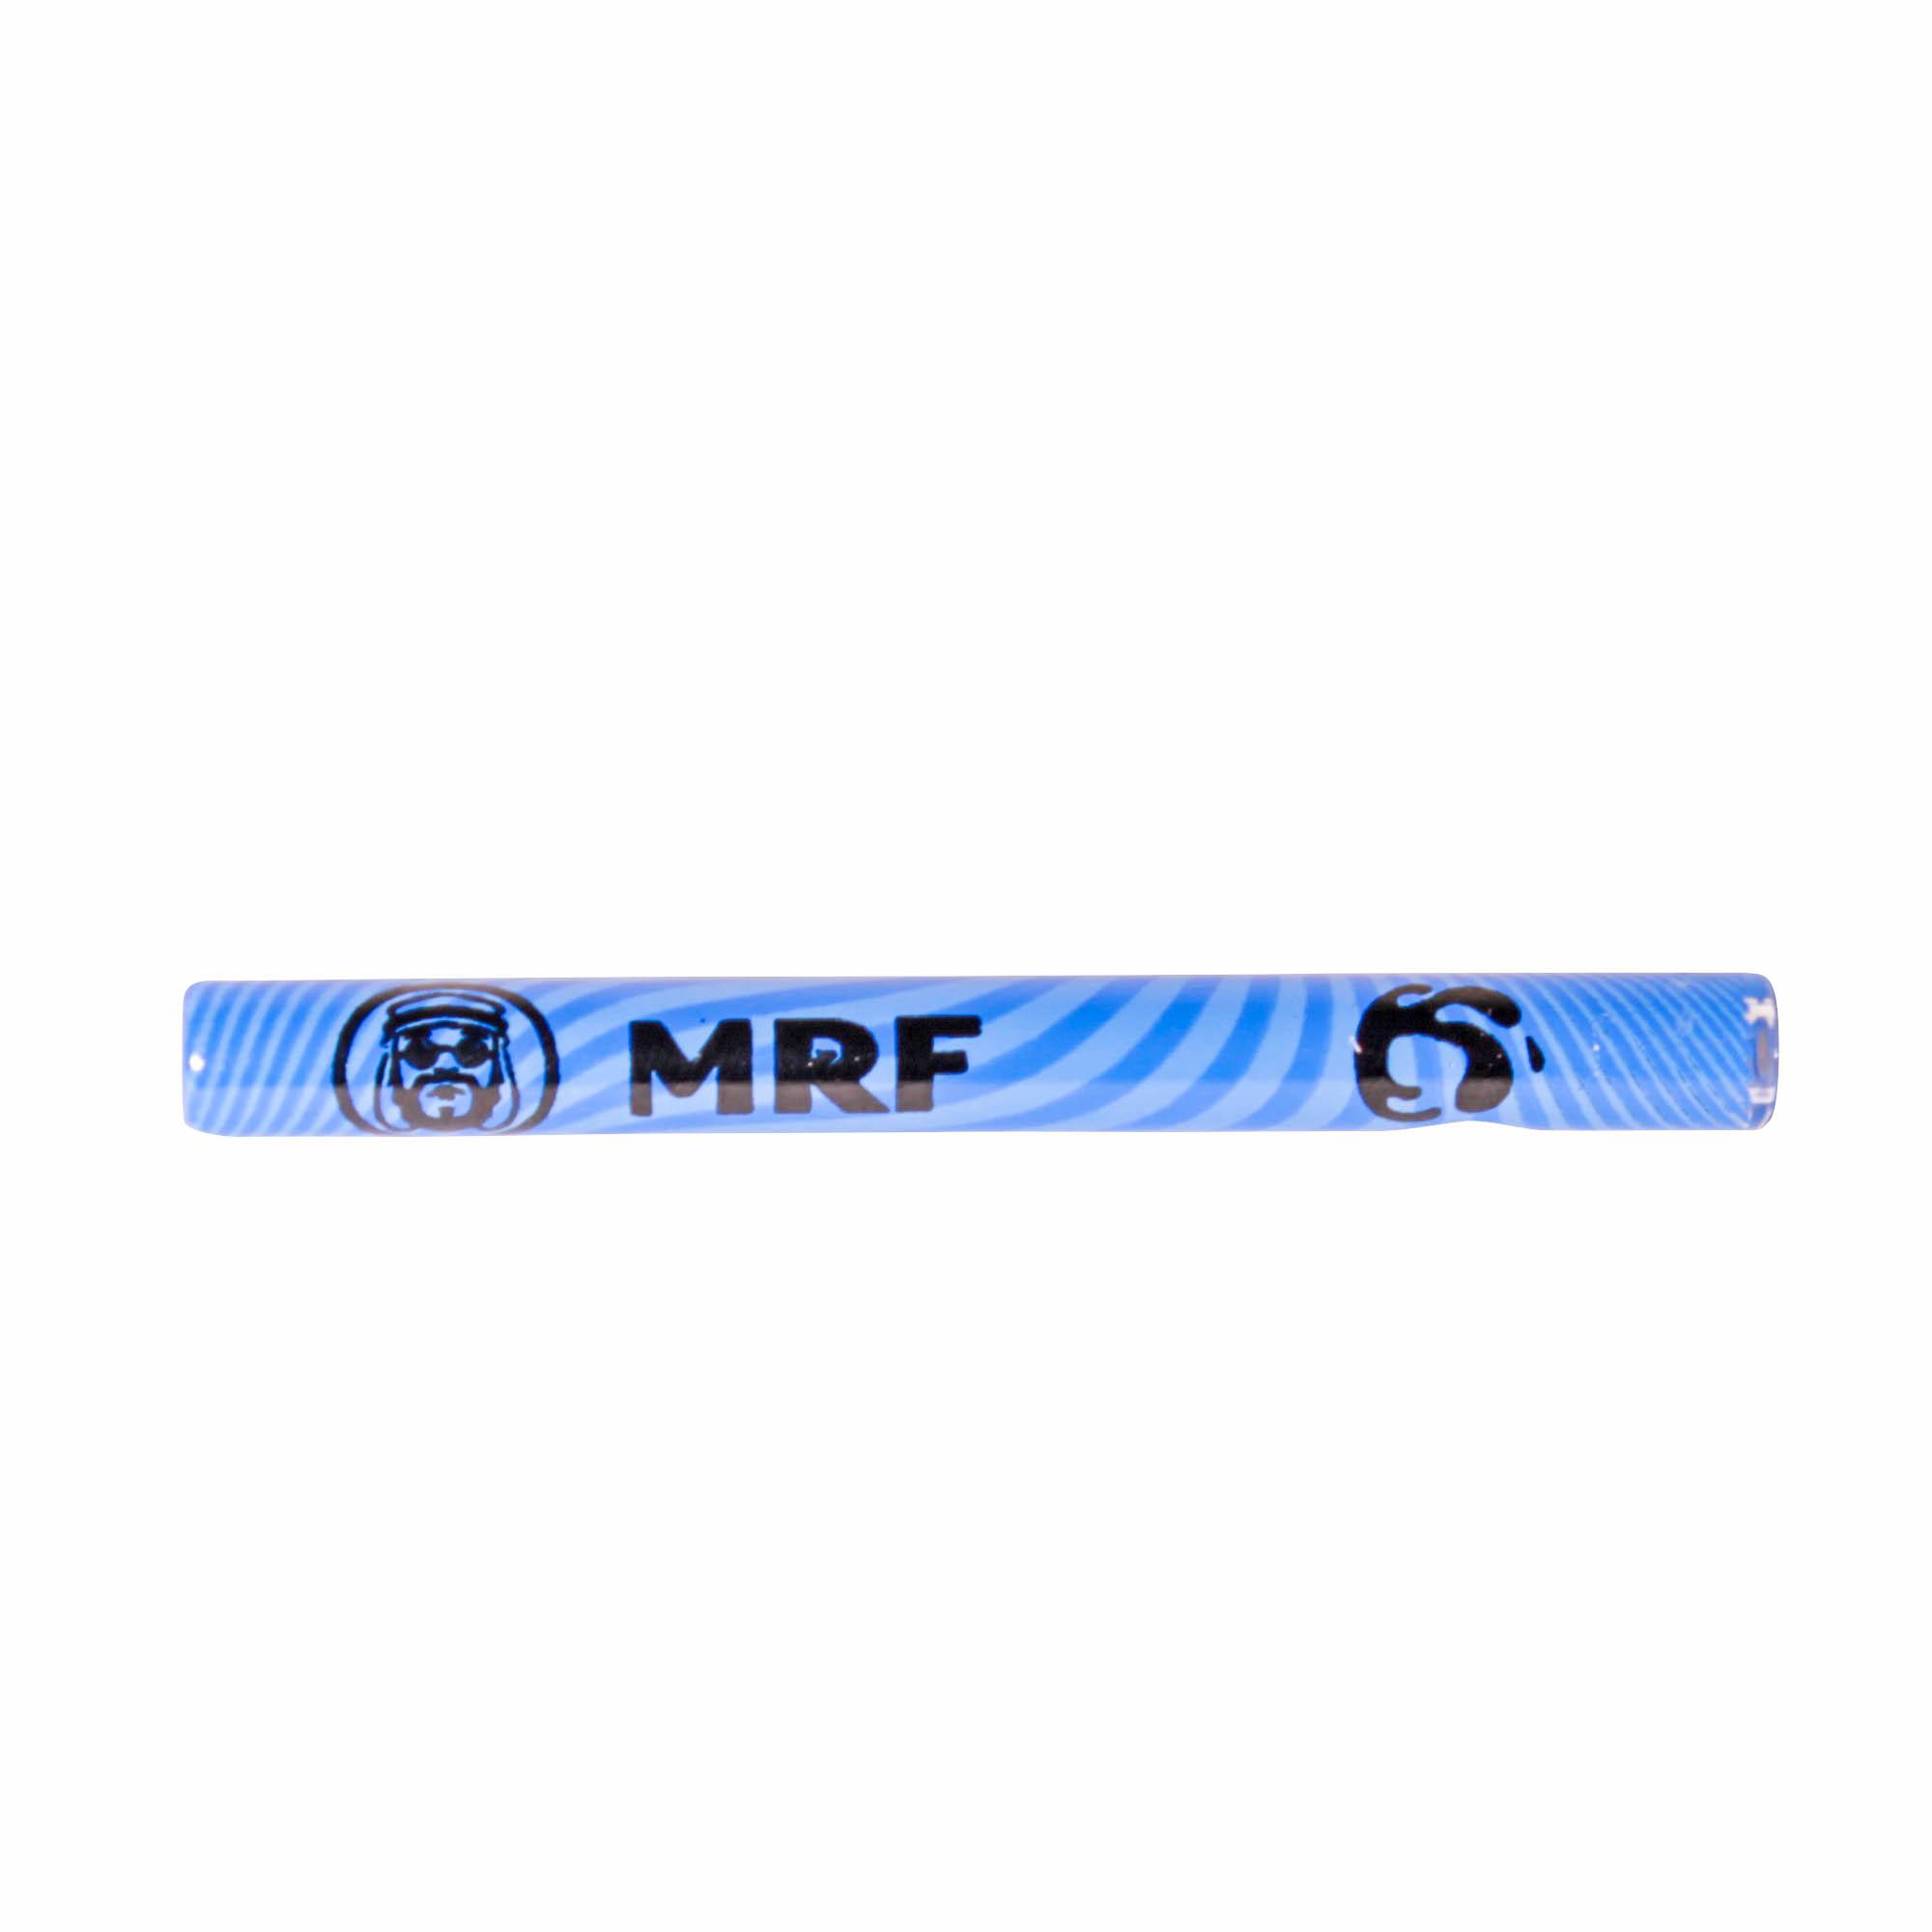 Piteira de Vidro MRF Elements Classic - Água (6 mm)  - Mr. Fumo